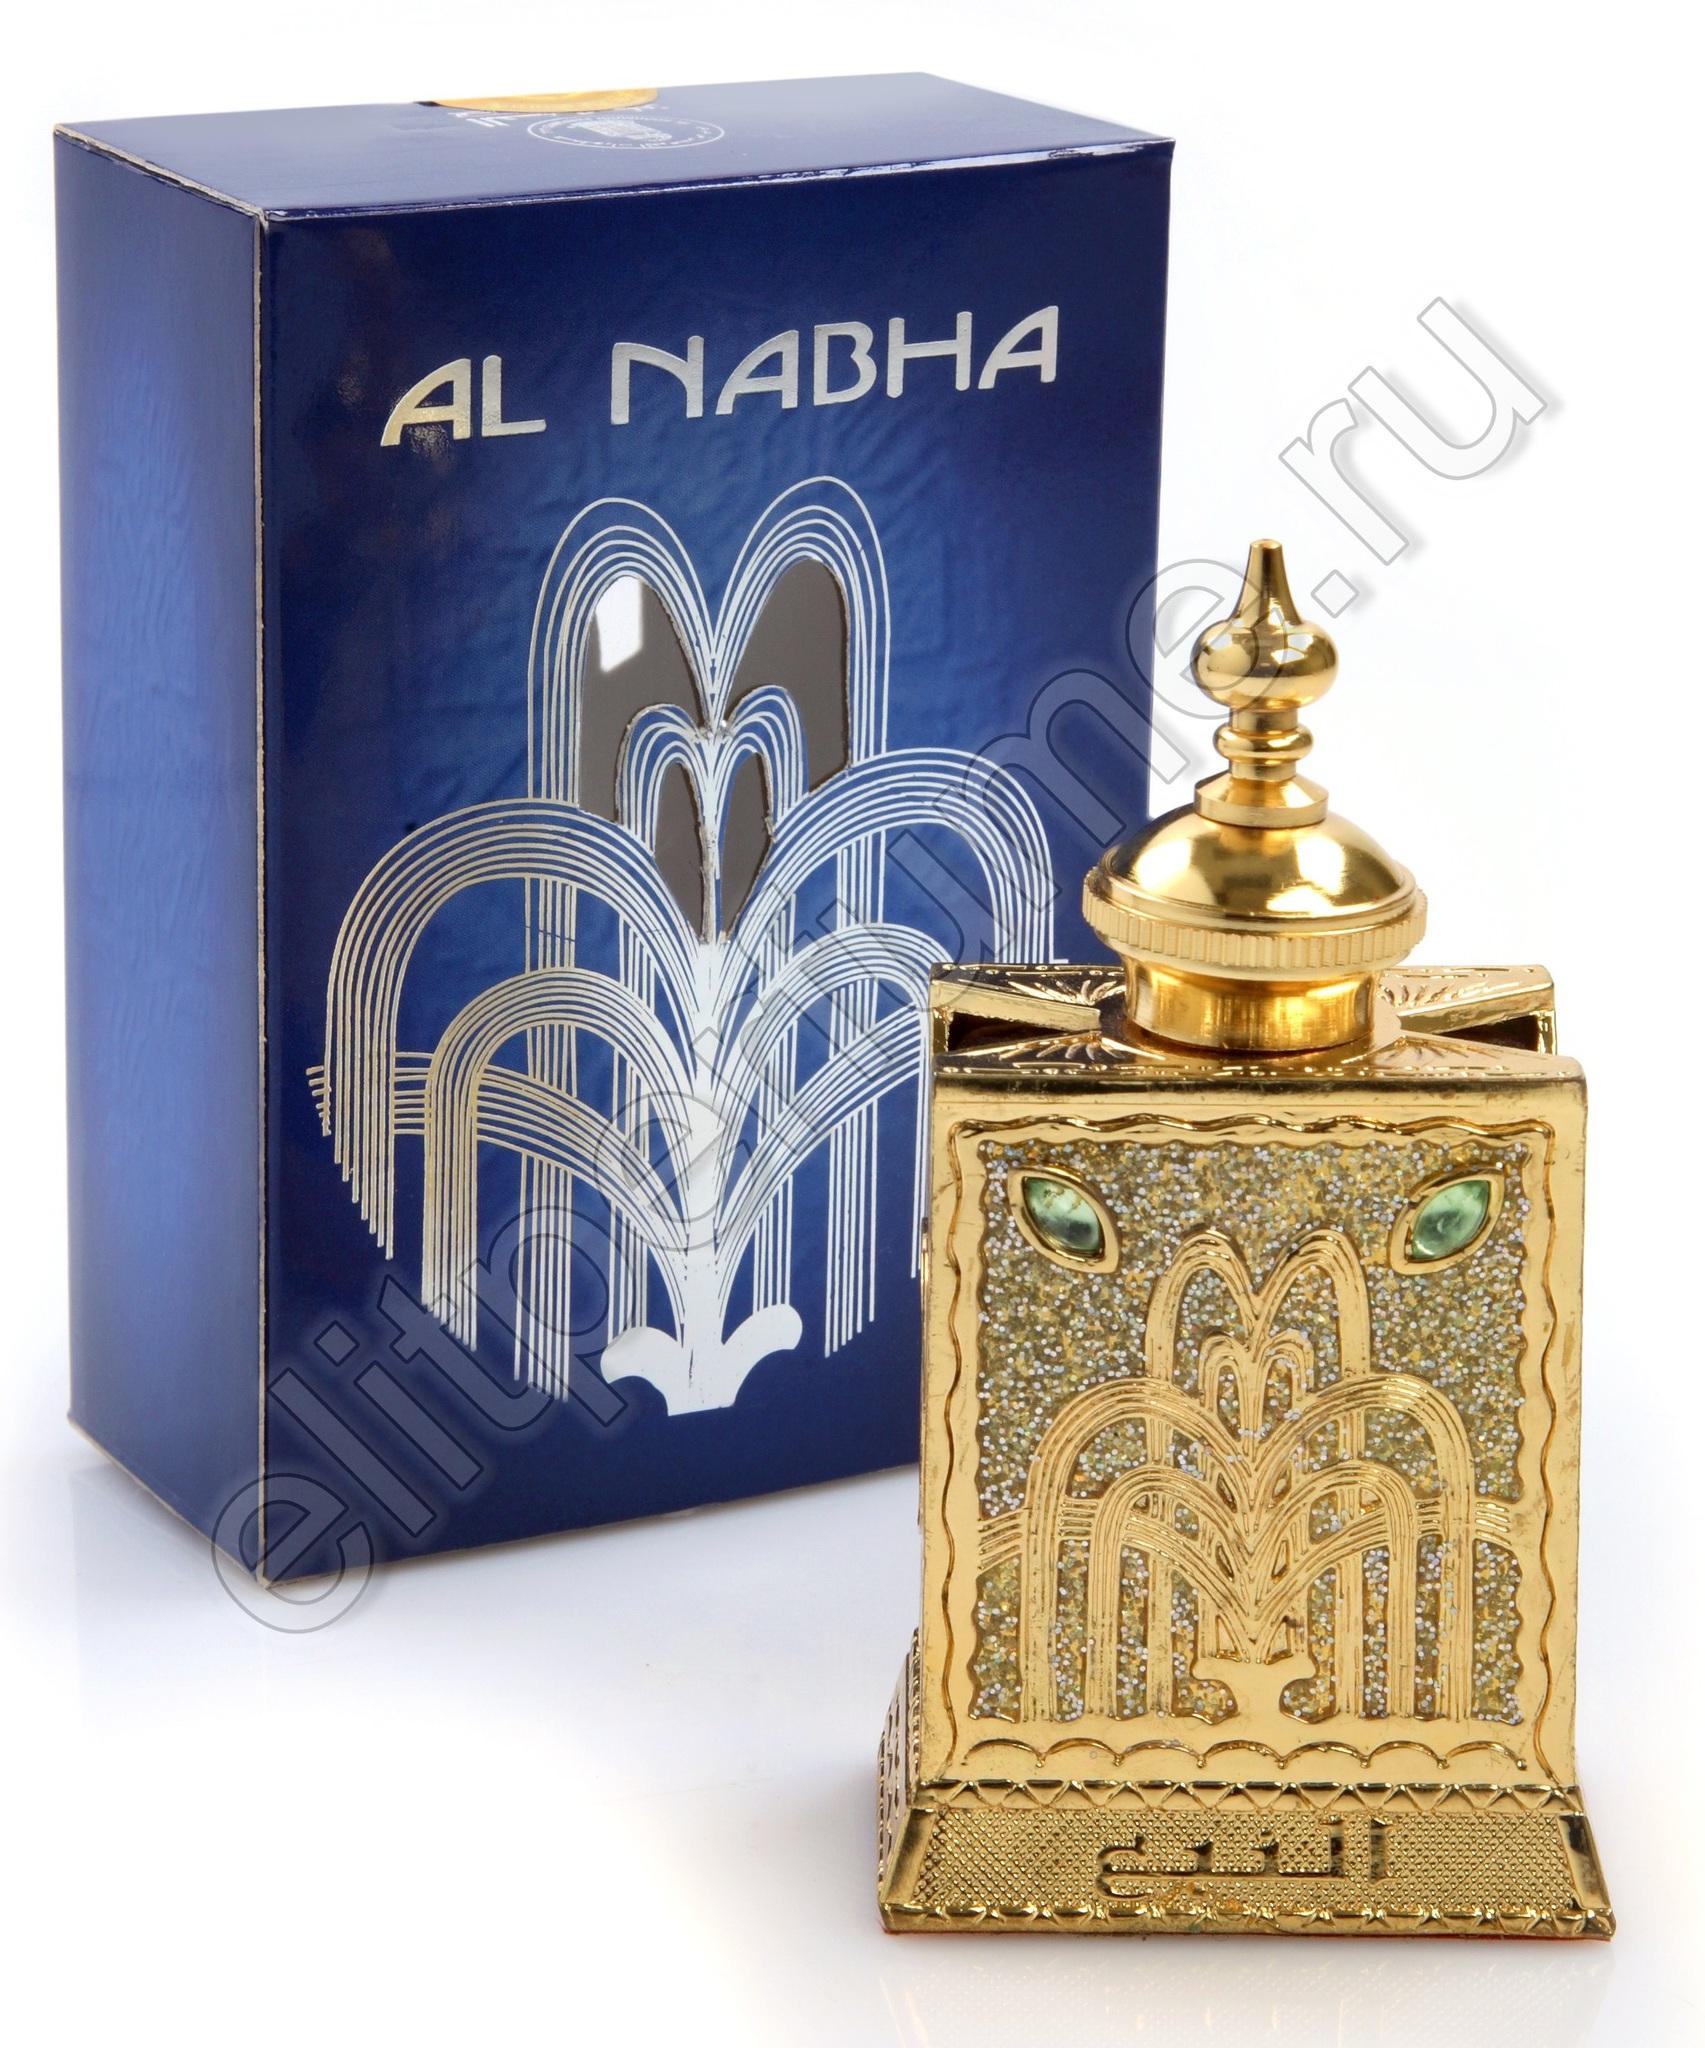 Пробники для духов Аль-Наба Al Nabha 1 мл арабские масляные духи от Аль Харамайн Al Haramin Perfumes